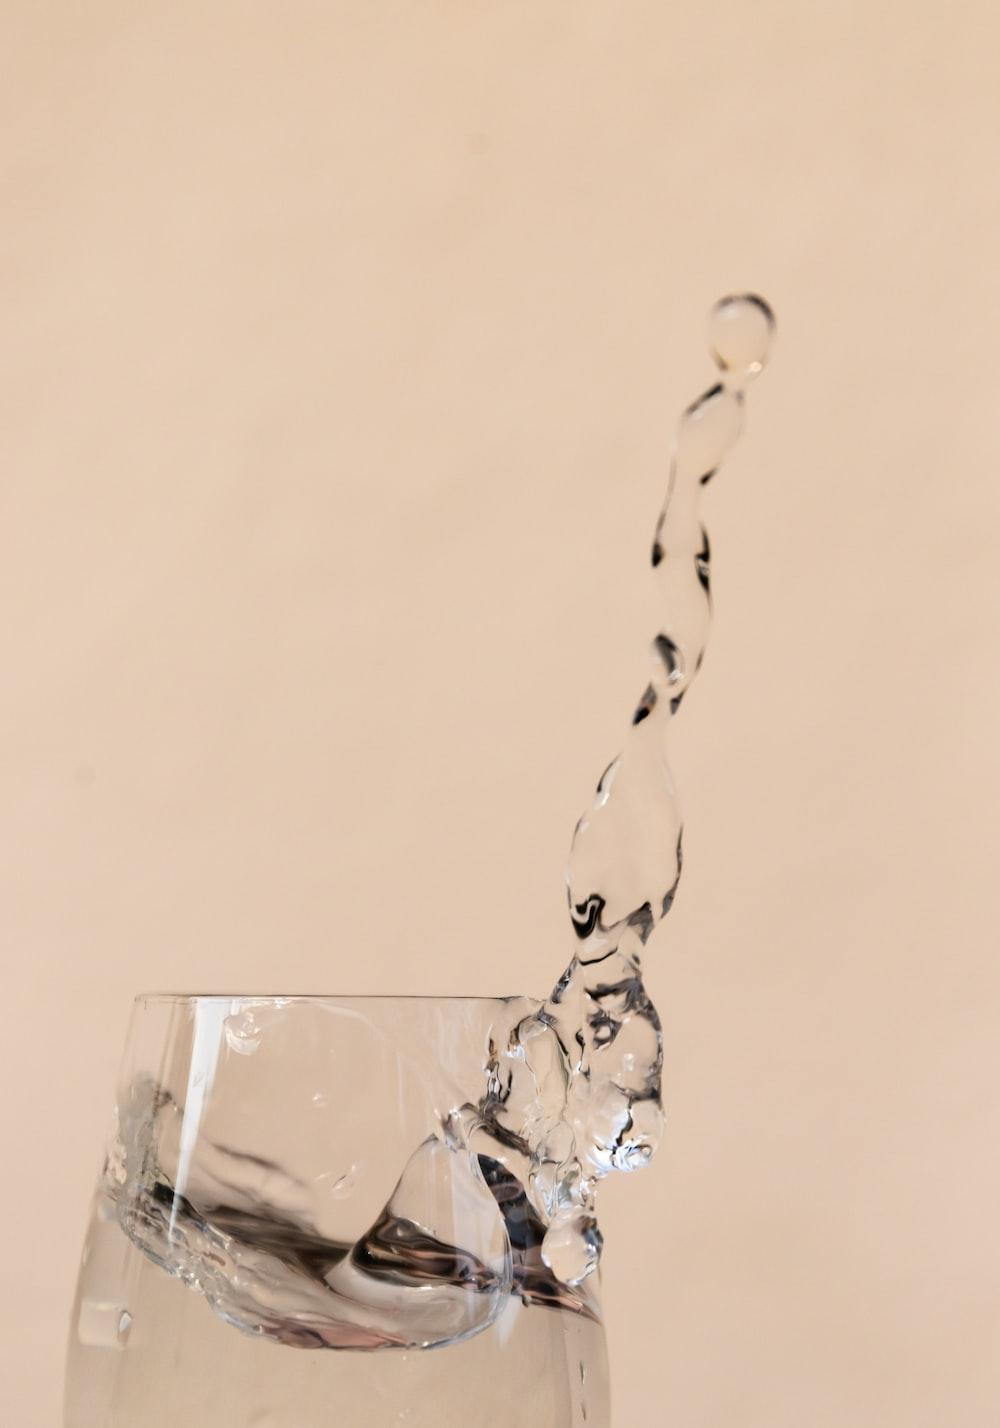 water splash on clear drinking glass